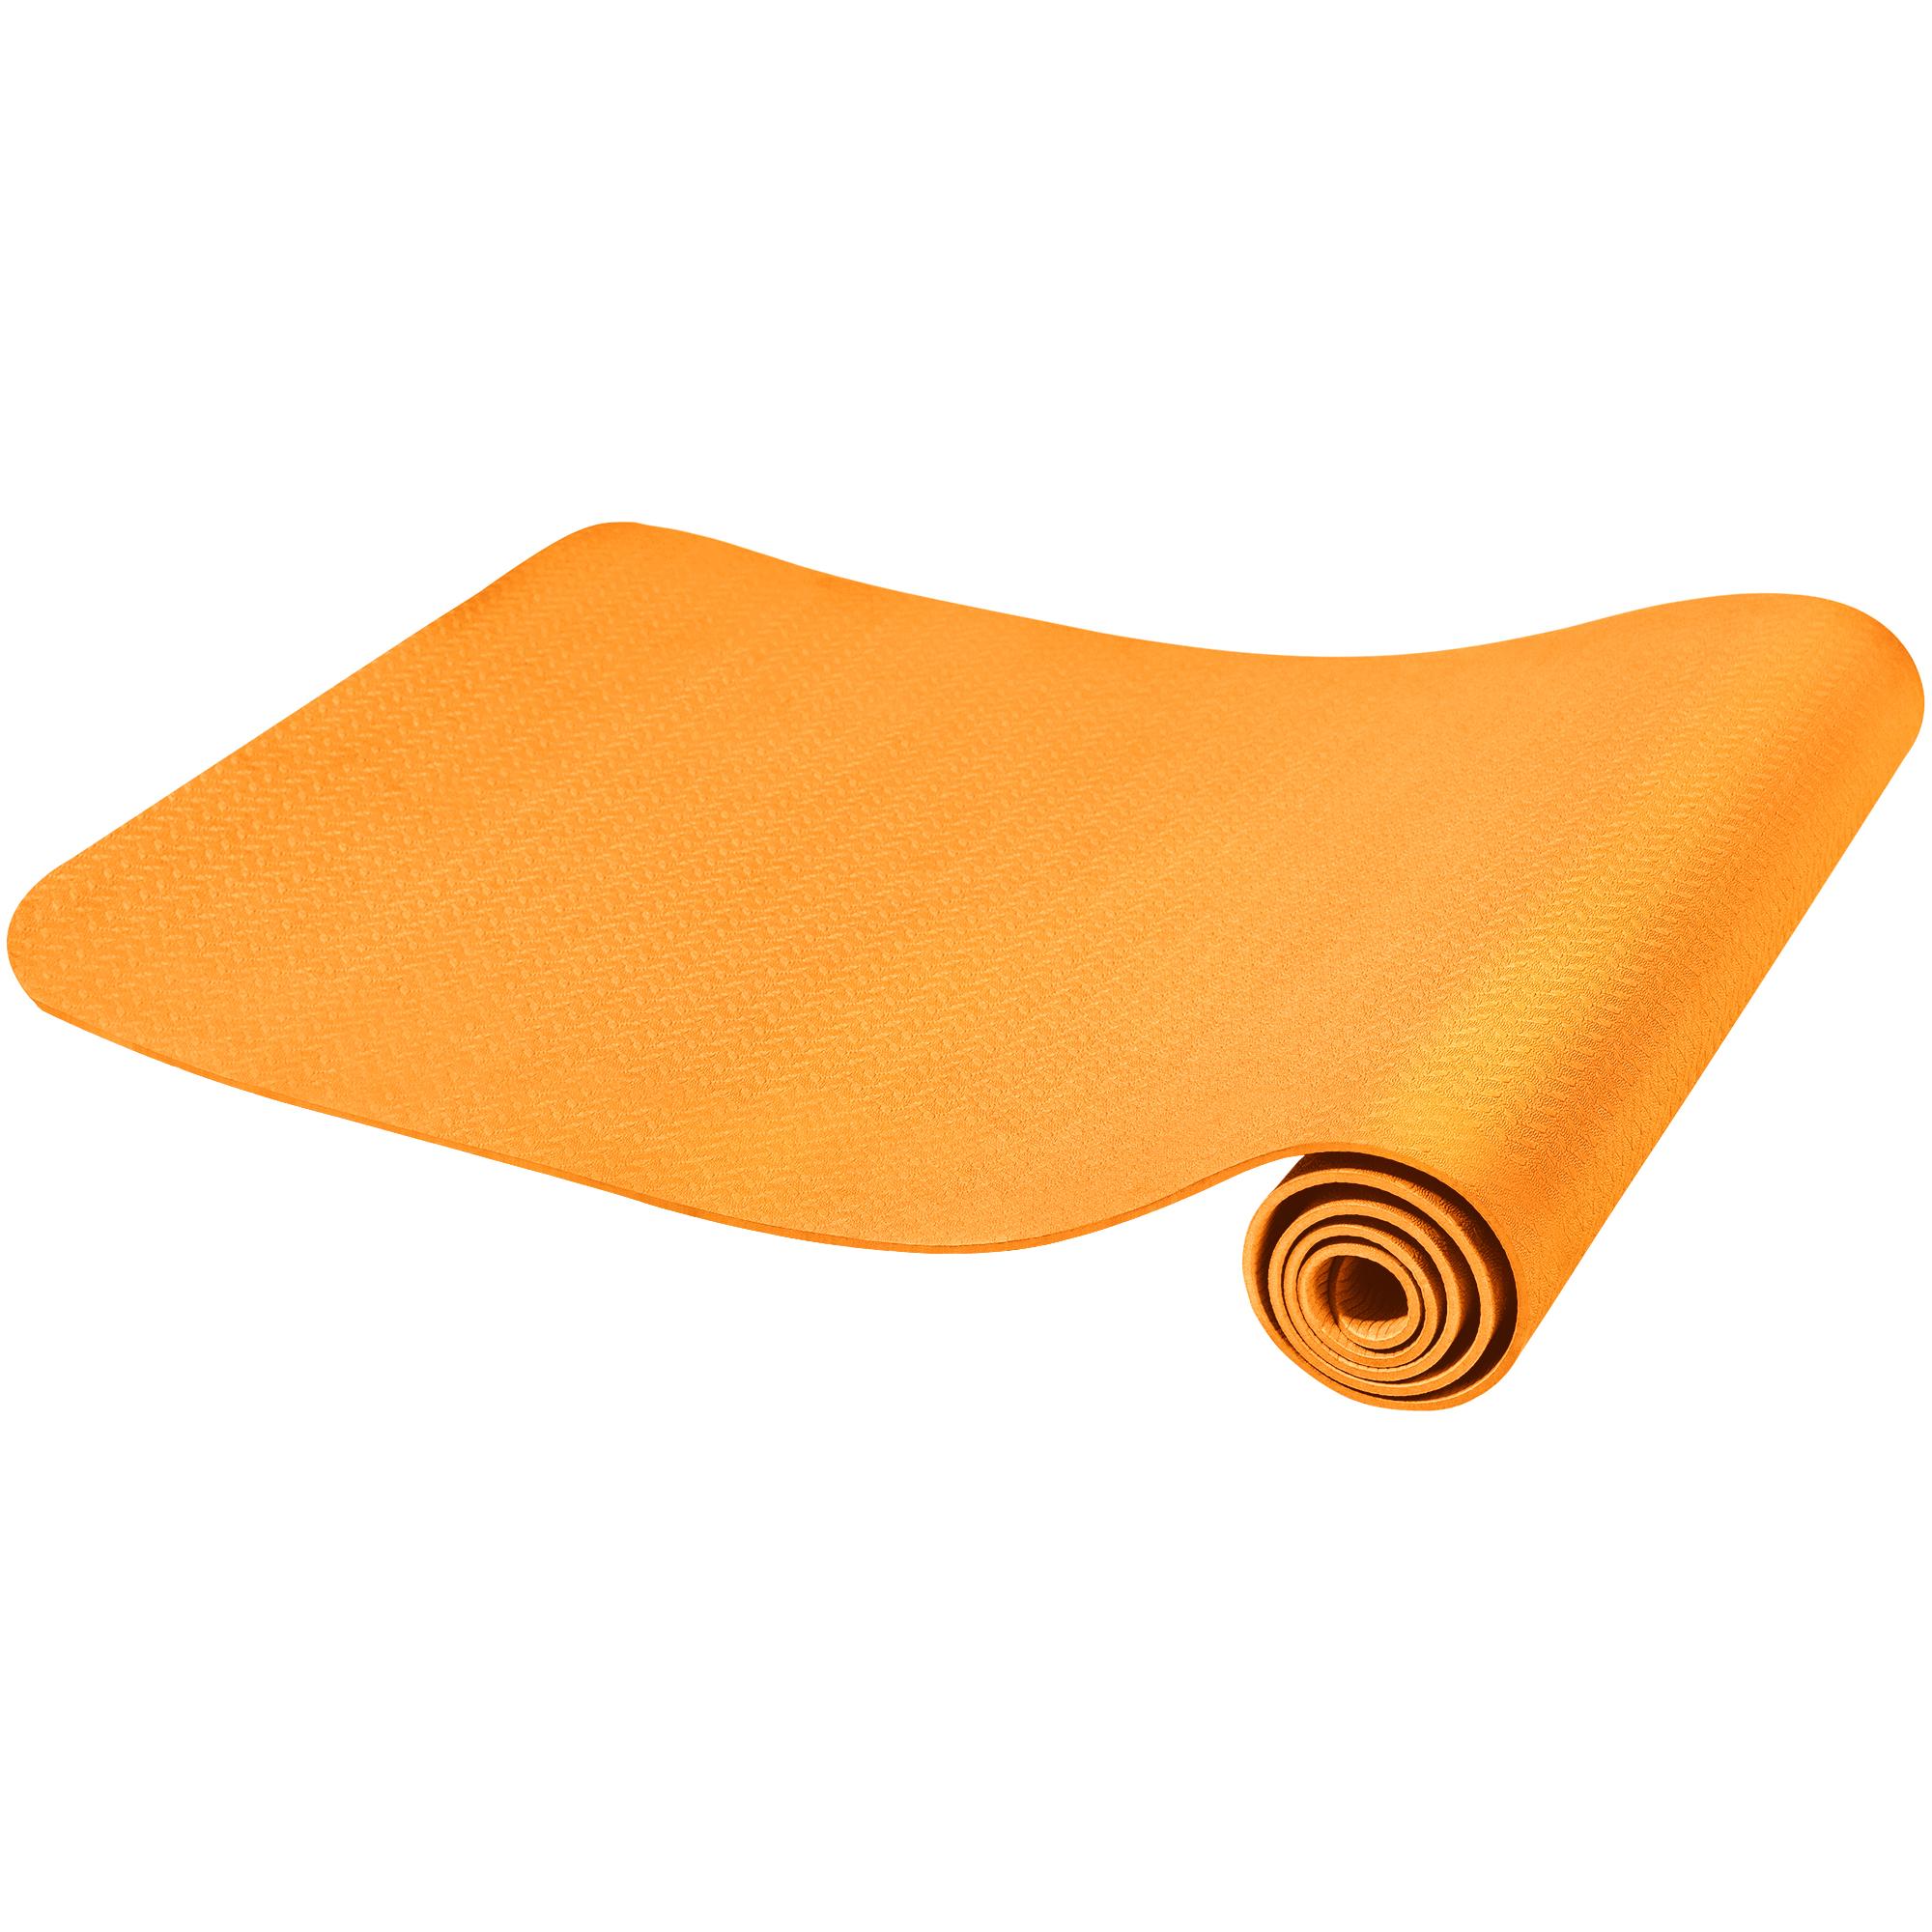 Gorilla Sports Yogamatte Dünn Orange 4 mm 100815-00036-0071